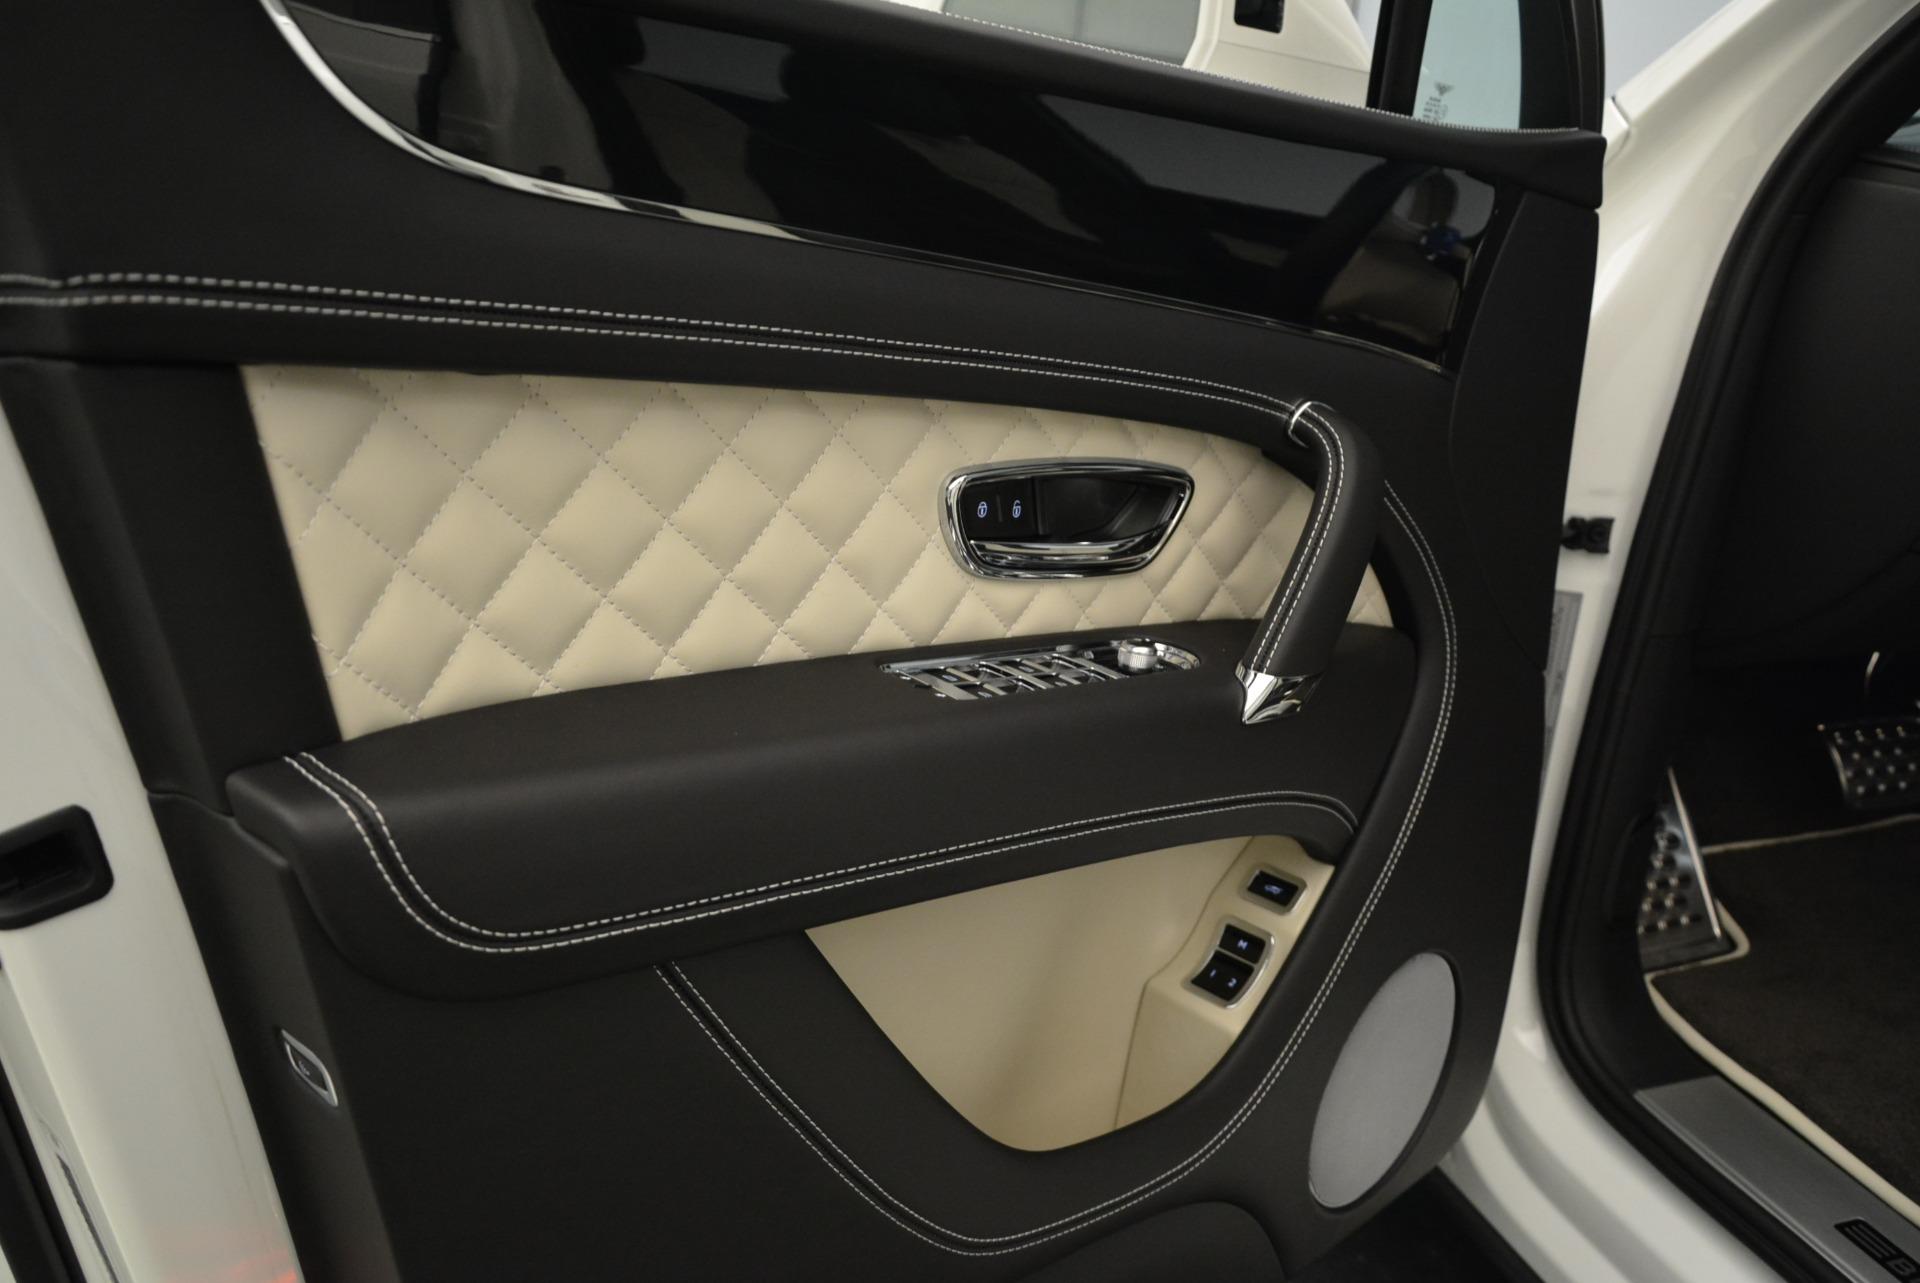 Used 2018 Bentley Bentayga Activity Edition For Sale In Westport, CT 1922_p17